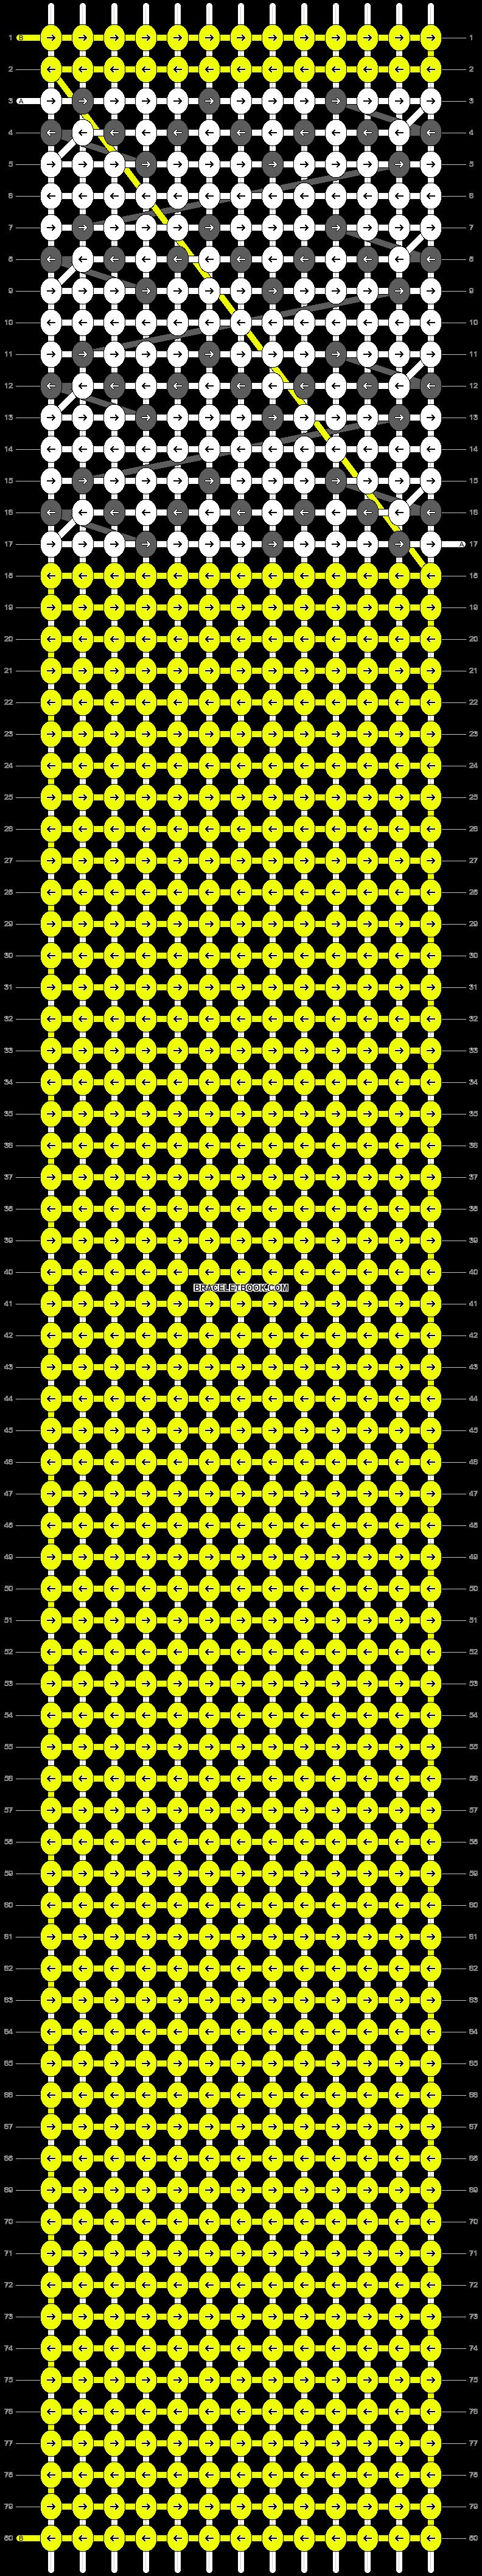 Alpha pattern #97016 pattern